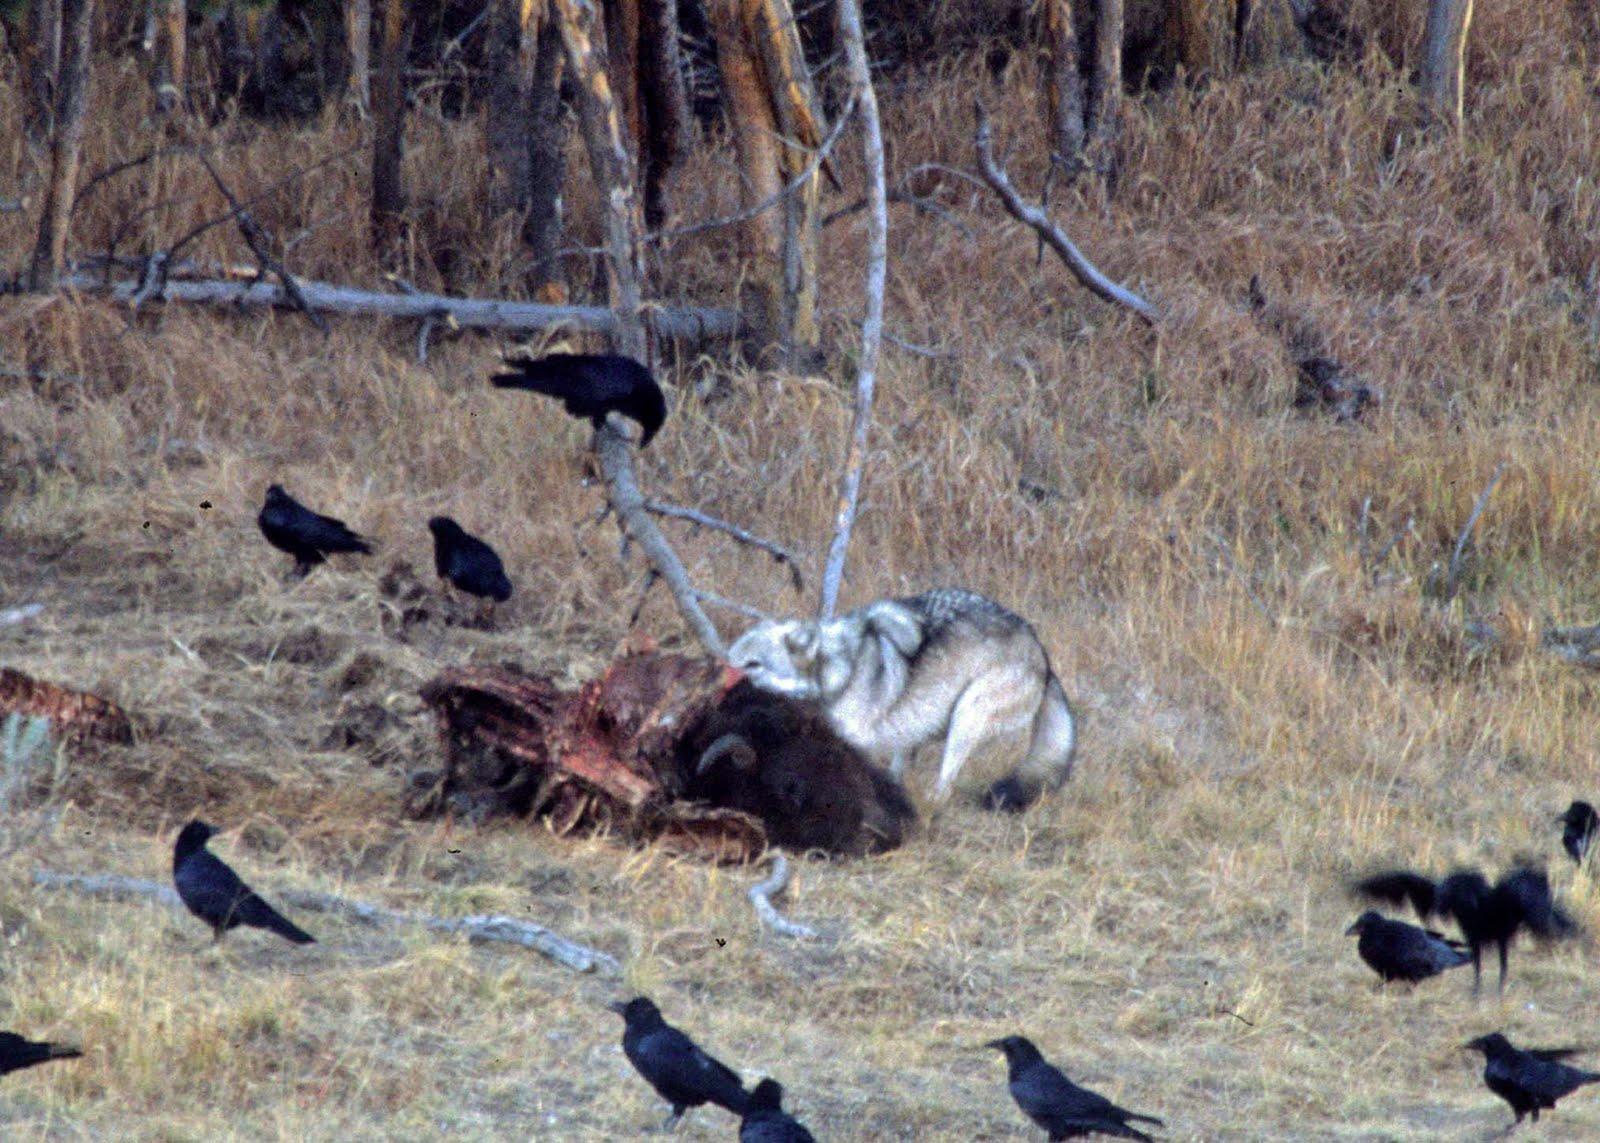 Wolf eating rabbit - photo#24